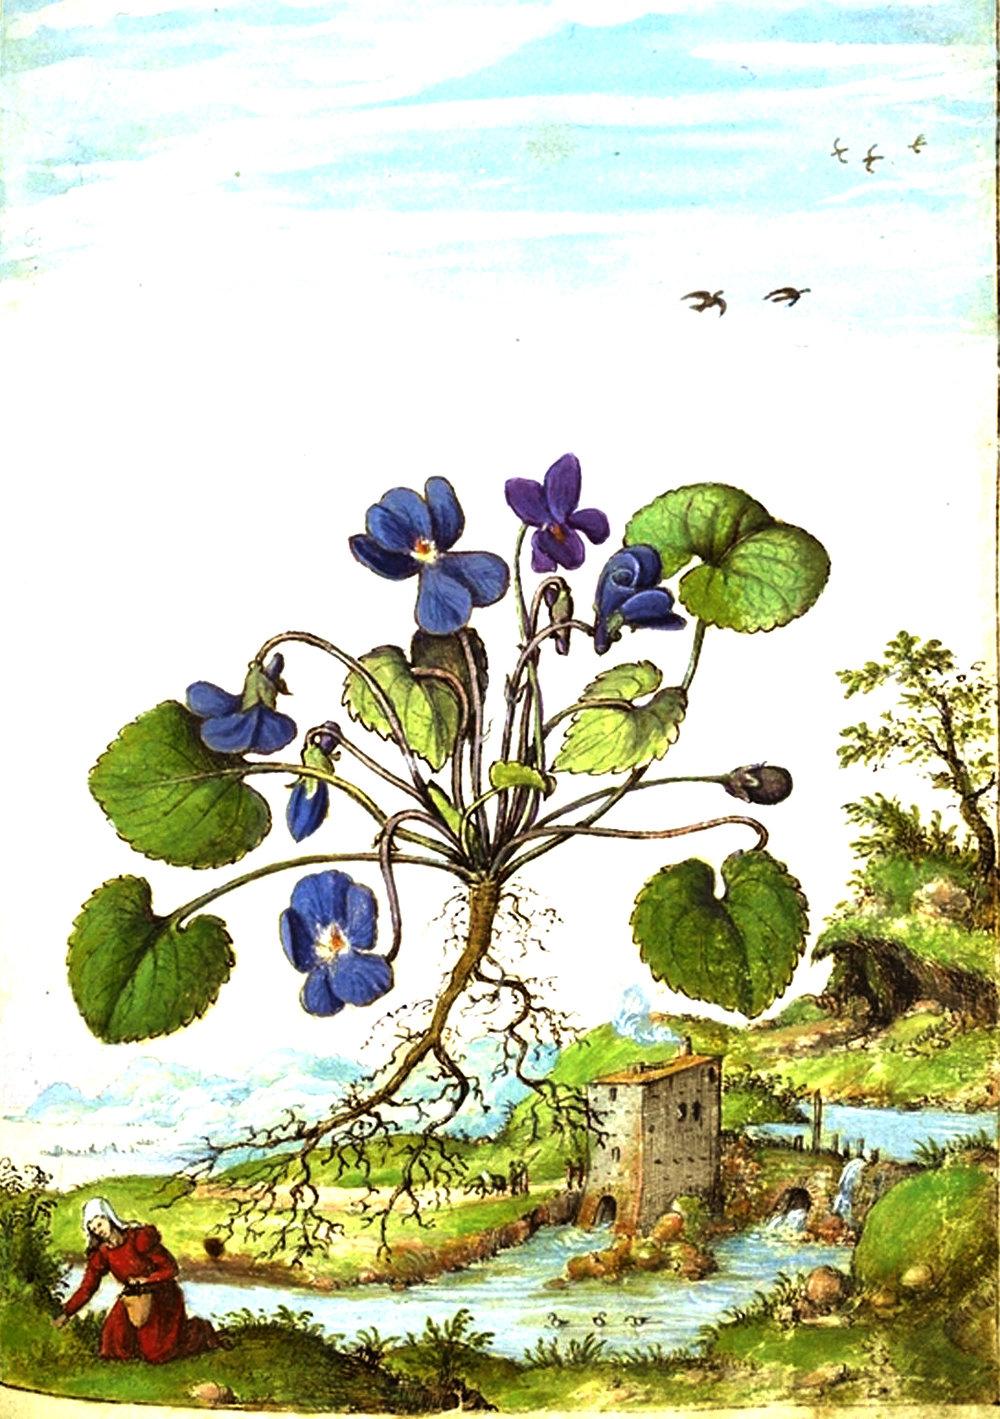 Antique botanical prints from Zorn 1779-1790 Violet, Viola odorata